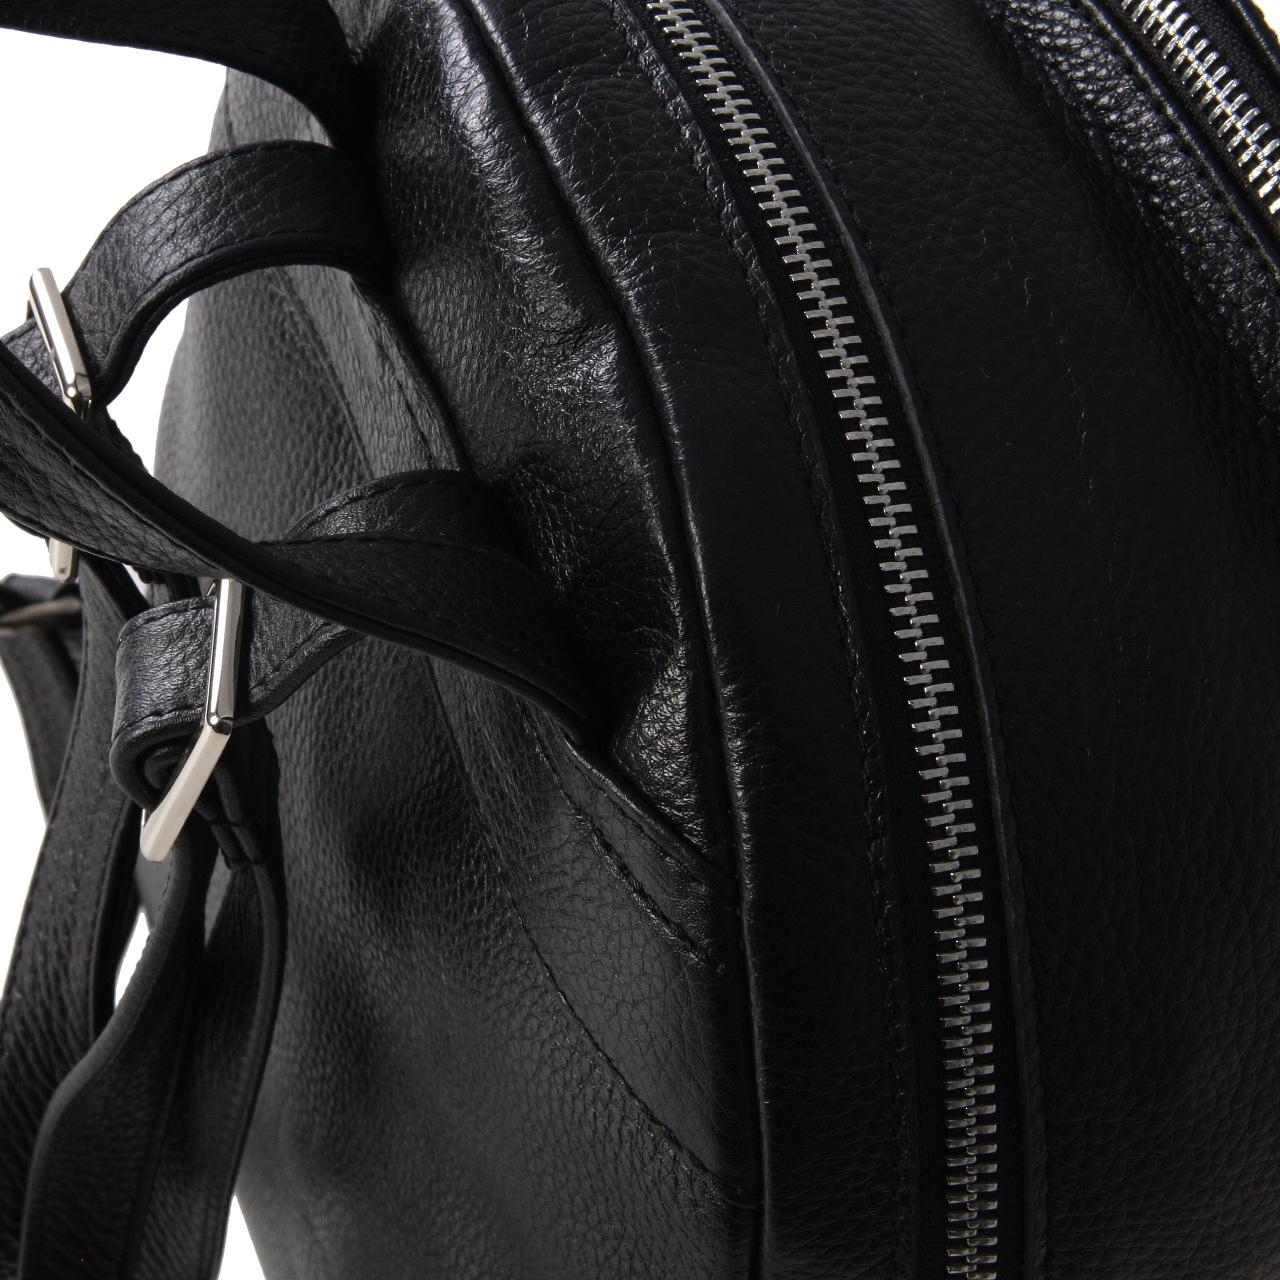 Bayan Sırt Çantası / 701 - Siyah